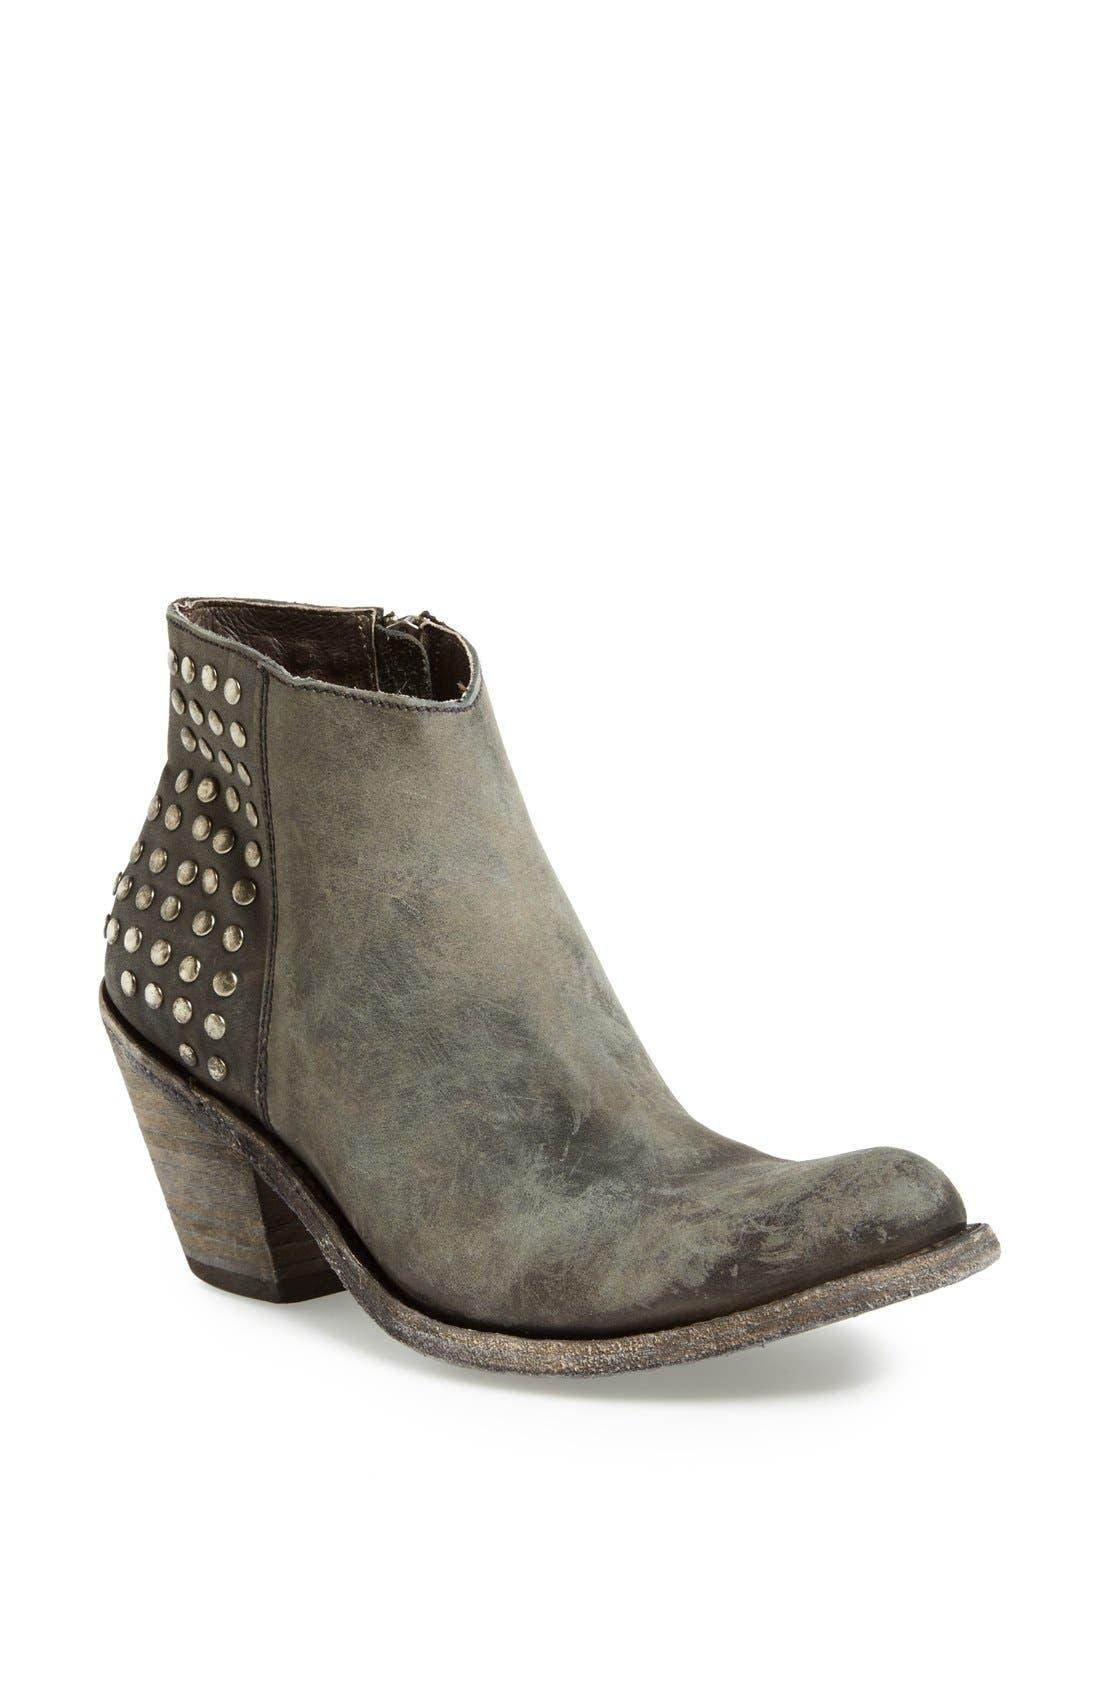 Alternate Image 1 Selected - Liberty Black Studded Short Boot